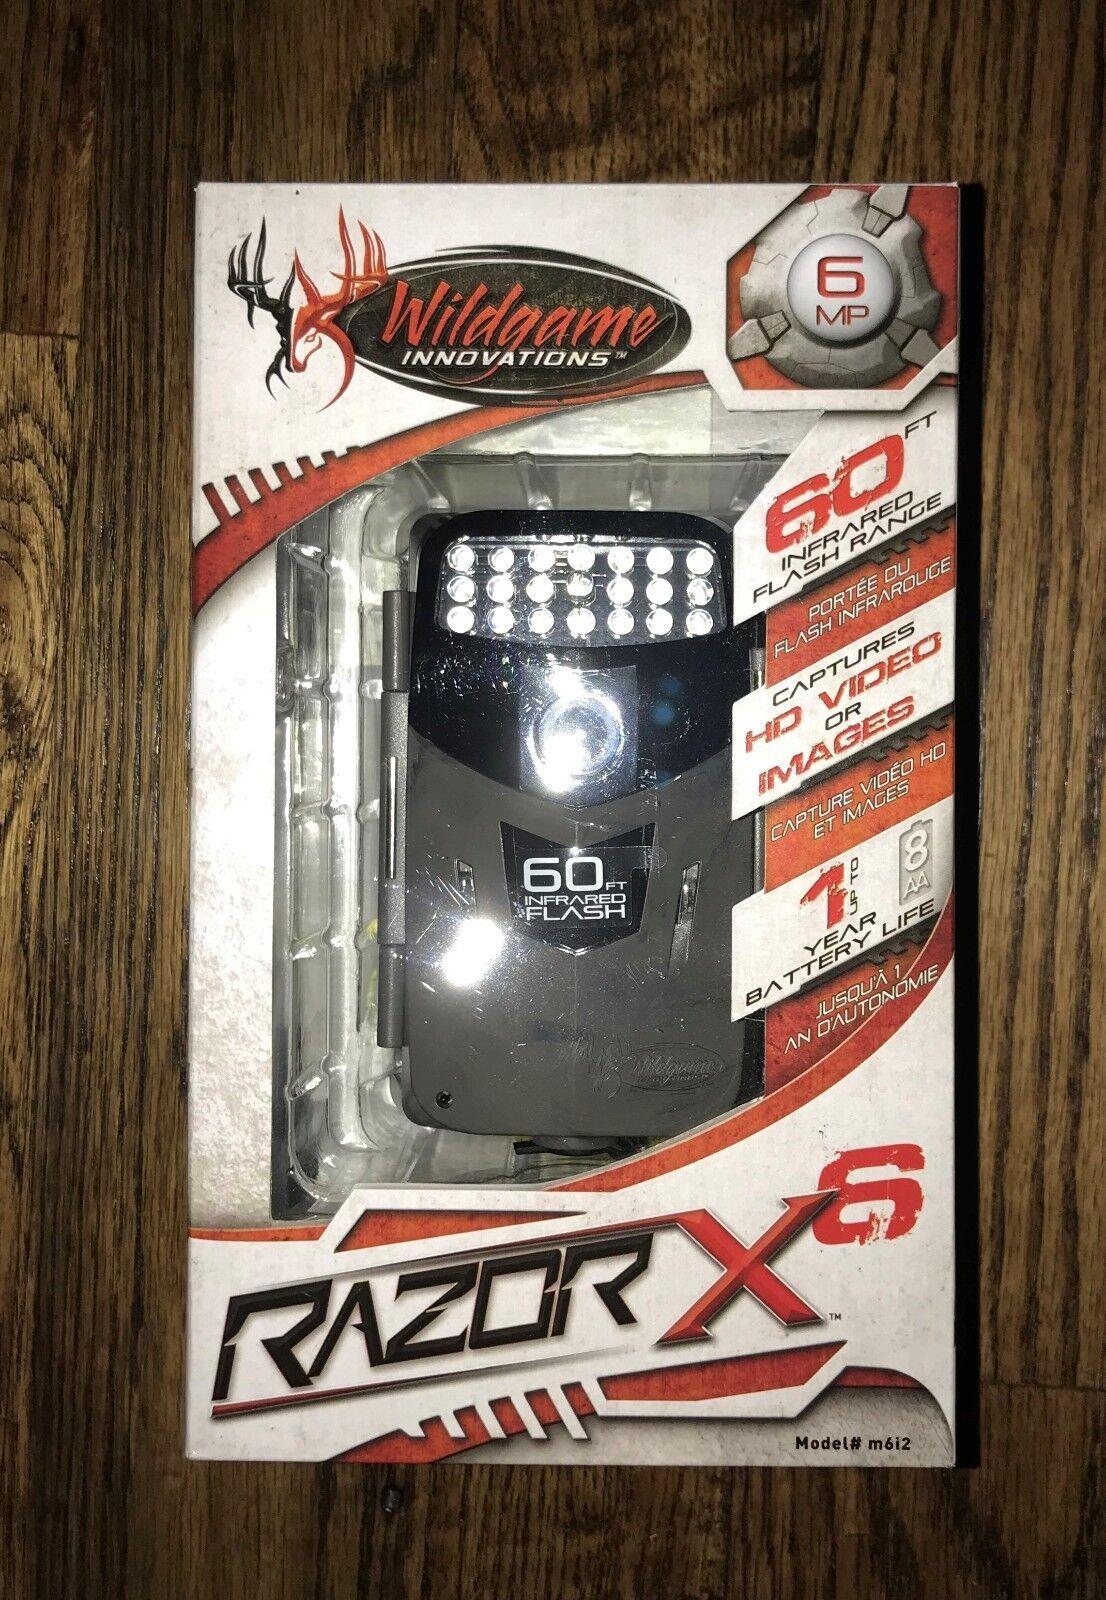 WILDGAME INNOVATIONS RAZOR X 6  CAMERA   MODEL m6i2  the newest